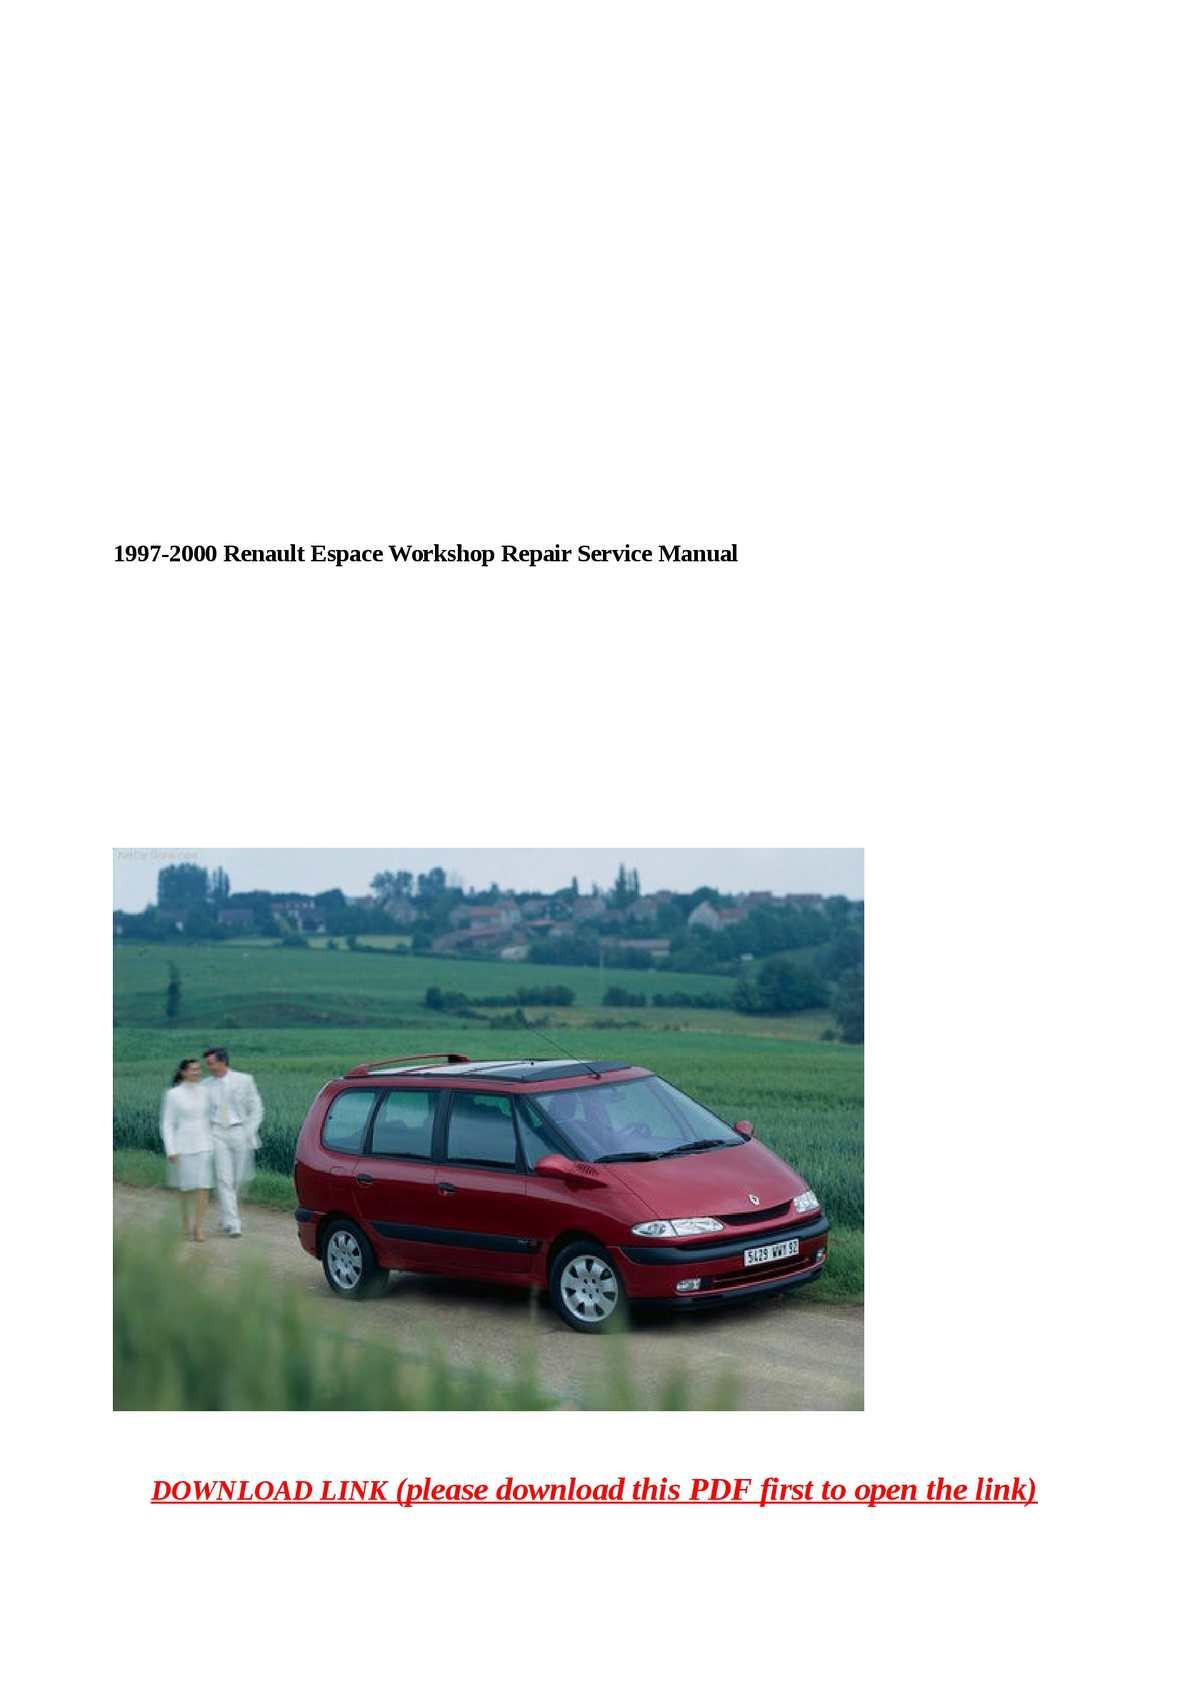 hight resolution of 1997 2000 renault espace workshop repair service manual